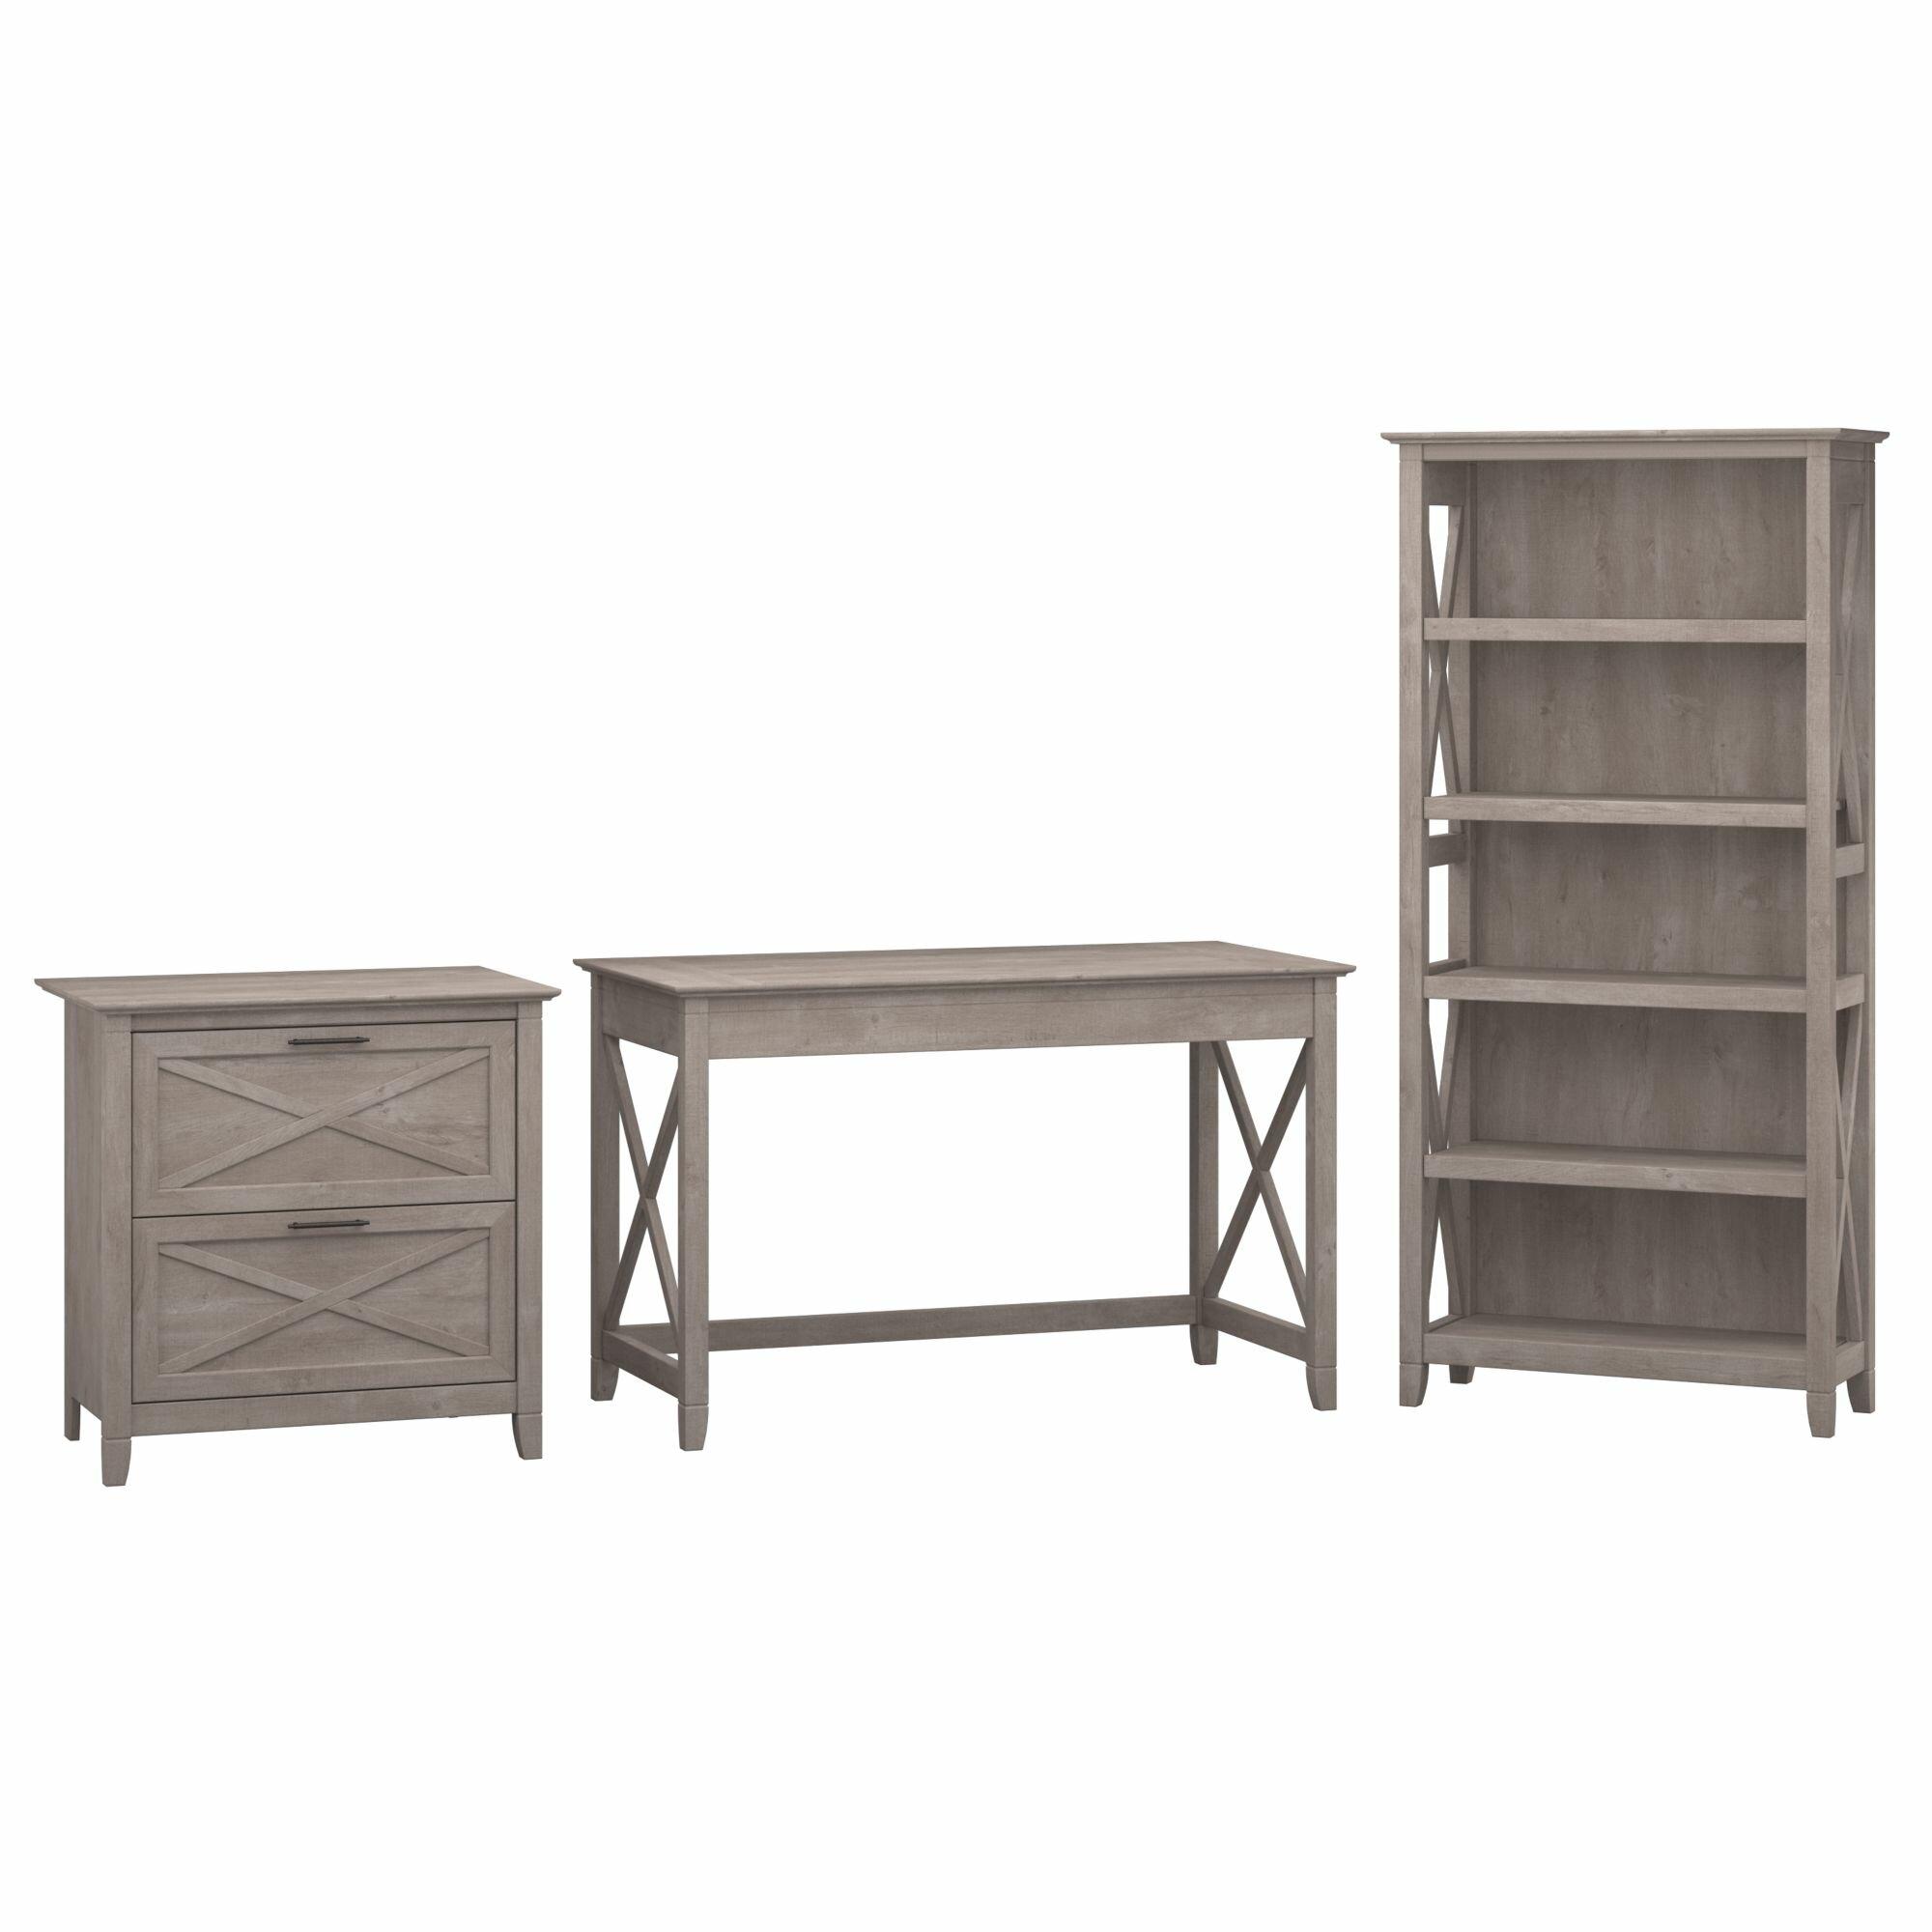 Bush furniture key west 3 piece standard desk office suite for Furniture 3 piece suites